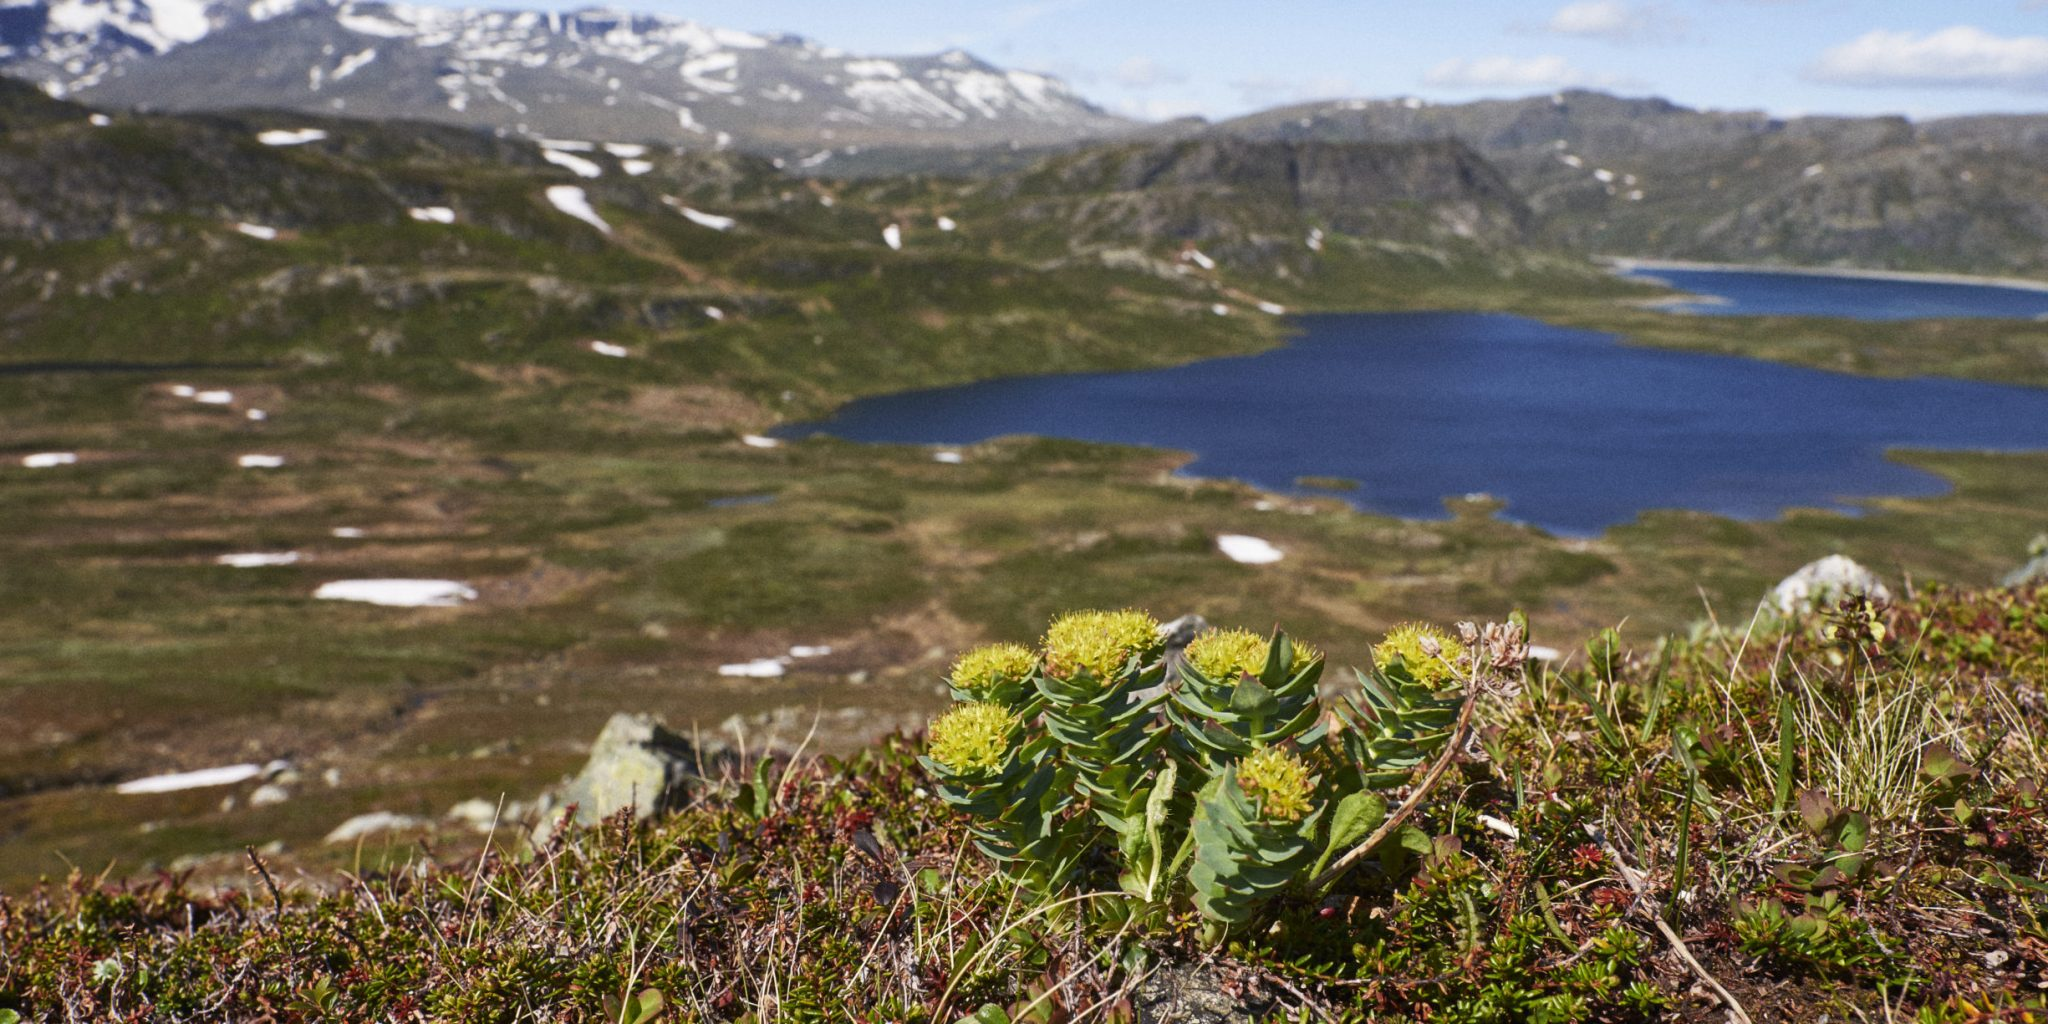 2019.06-Jotunheimen-BitihornOgSkyrifjellet-By Petter Olsen – MoN (28)